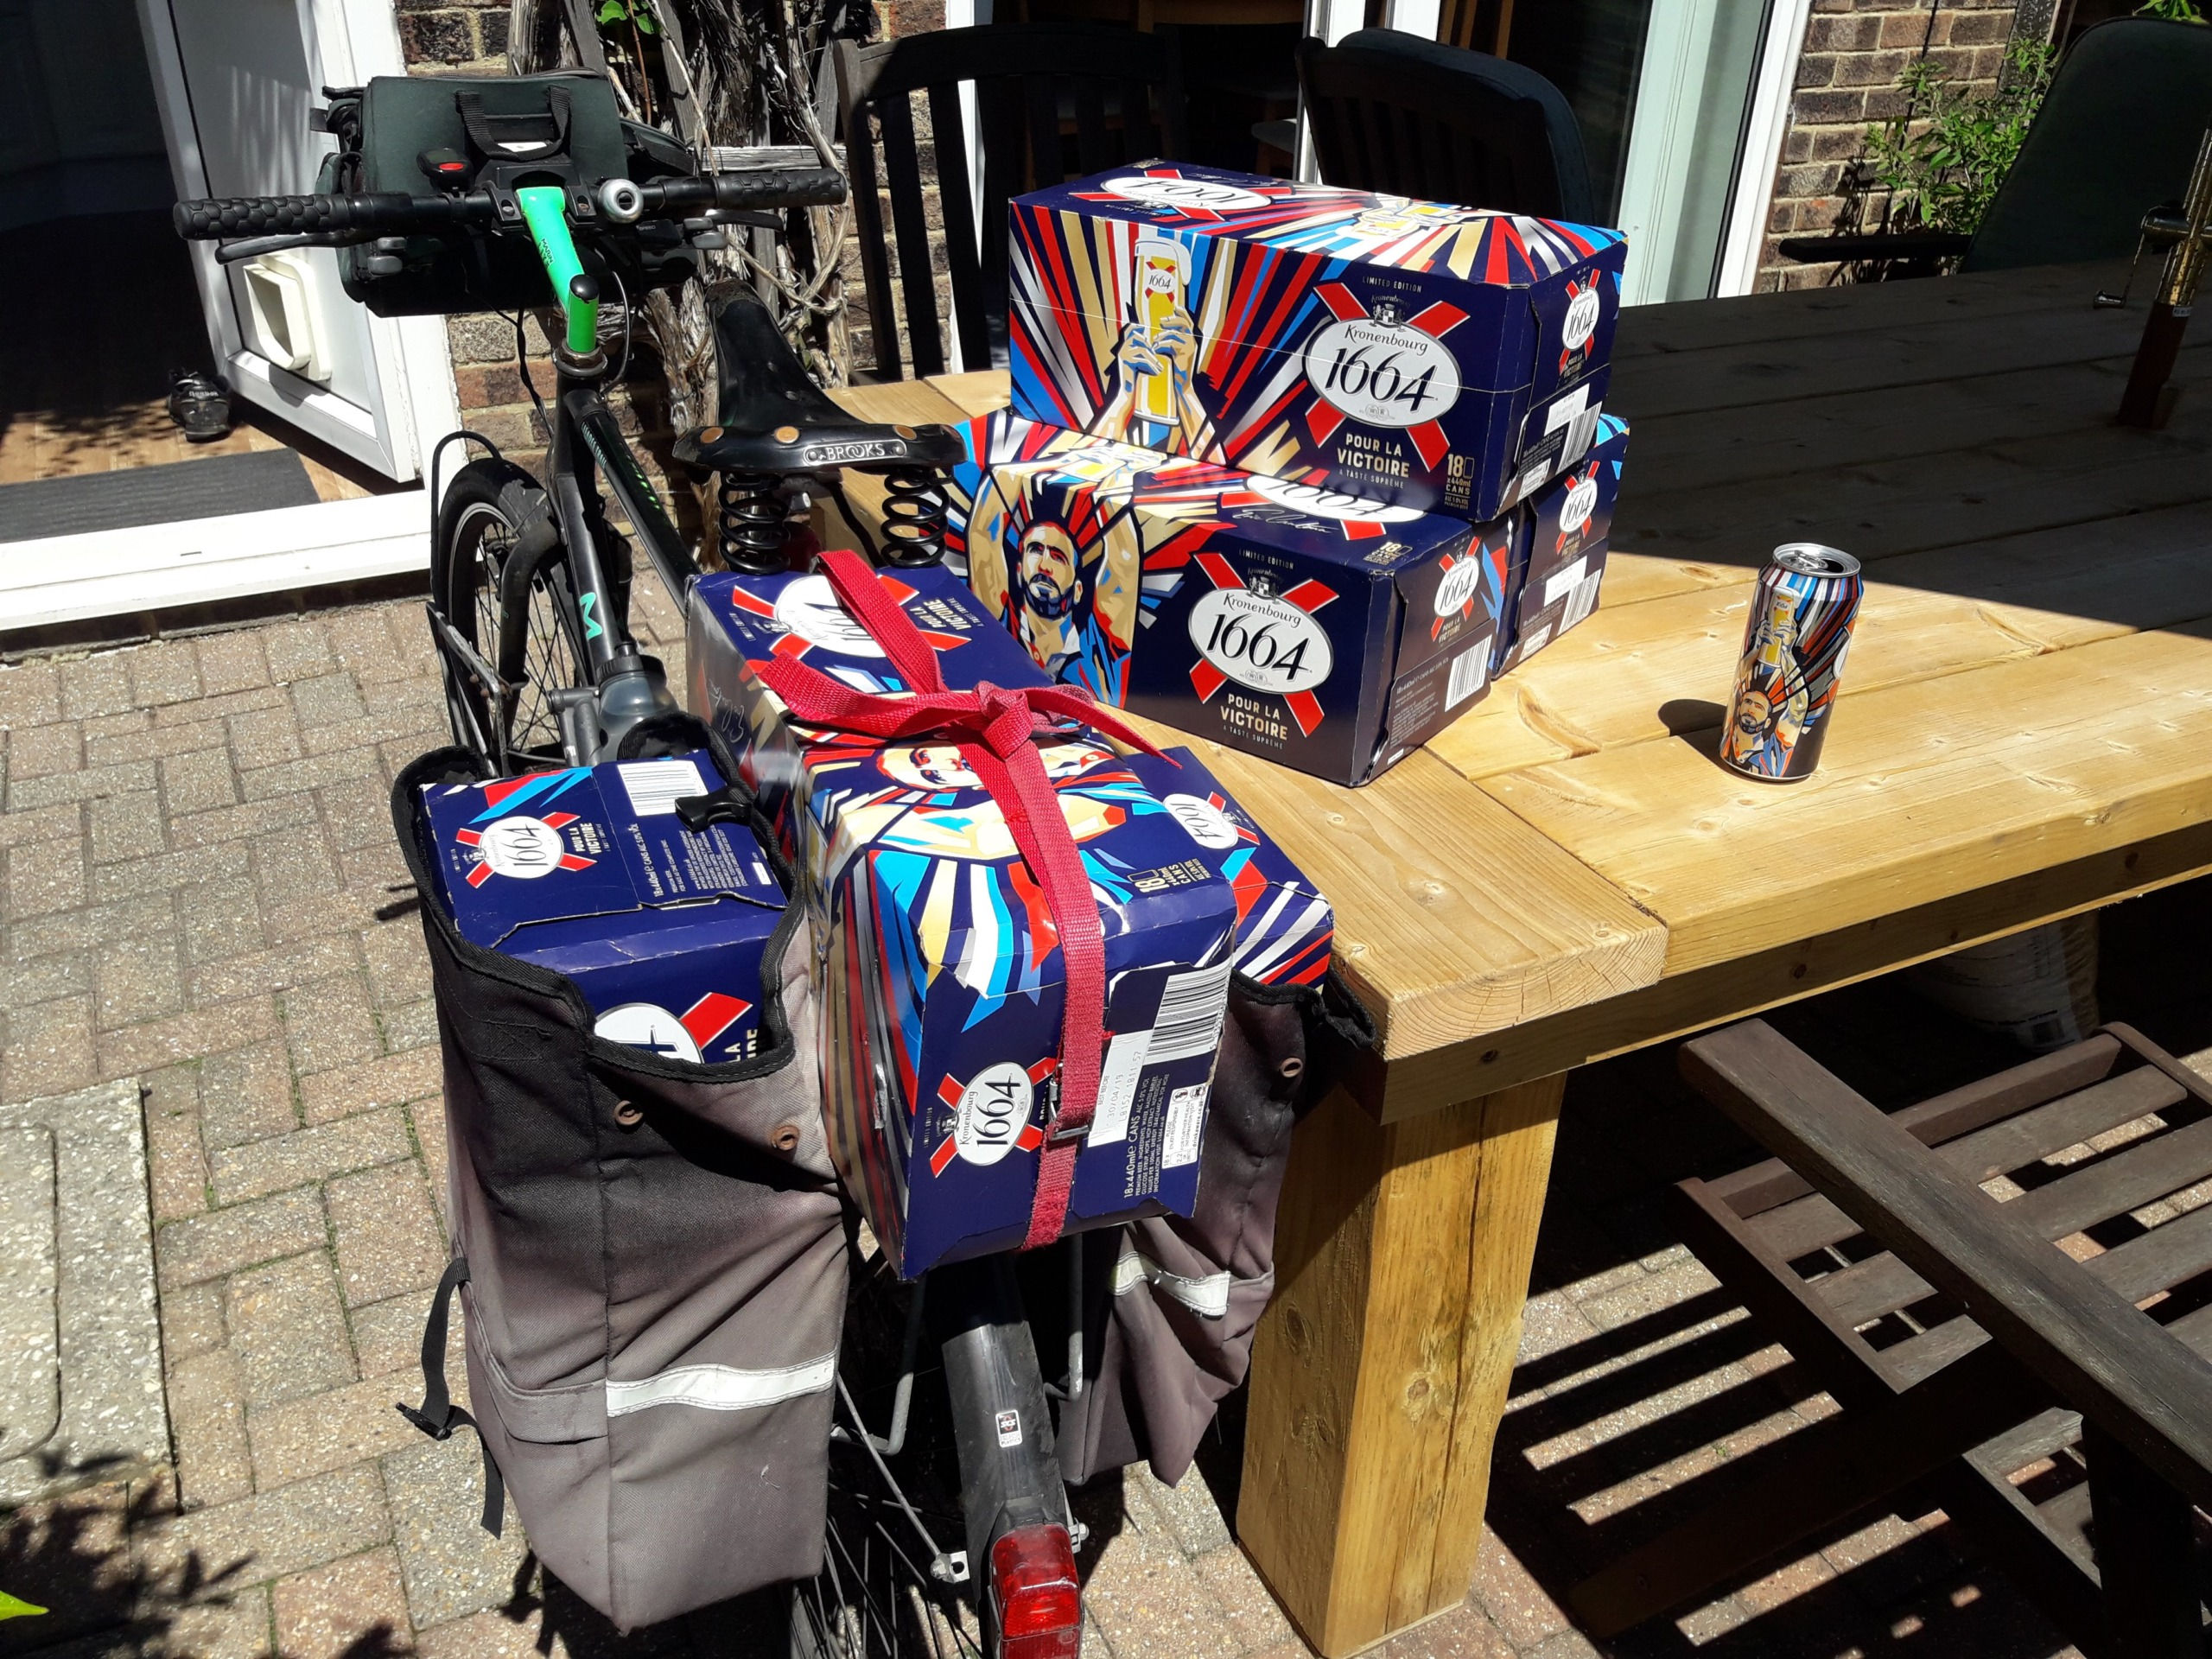 Beer on a bike